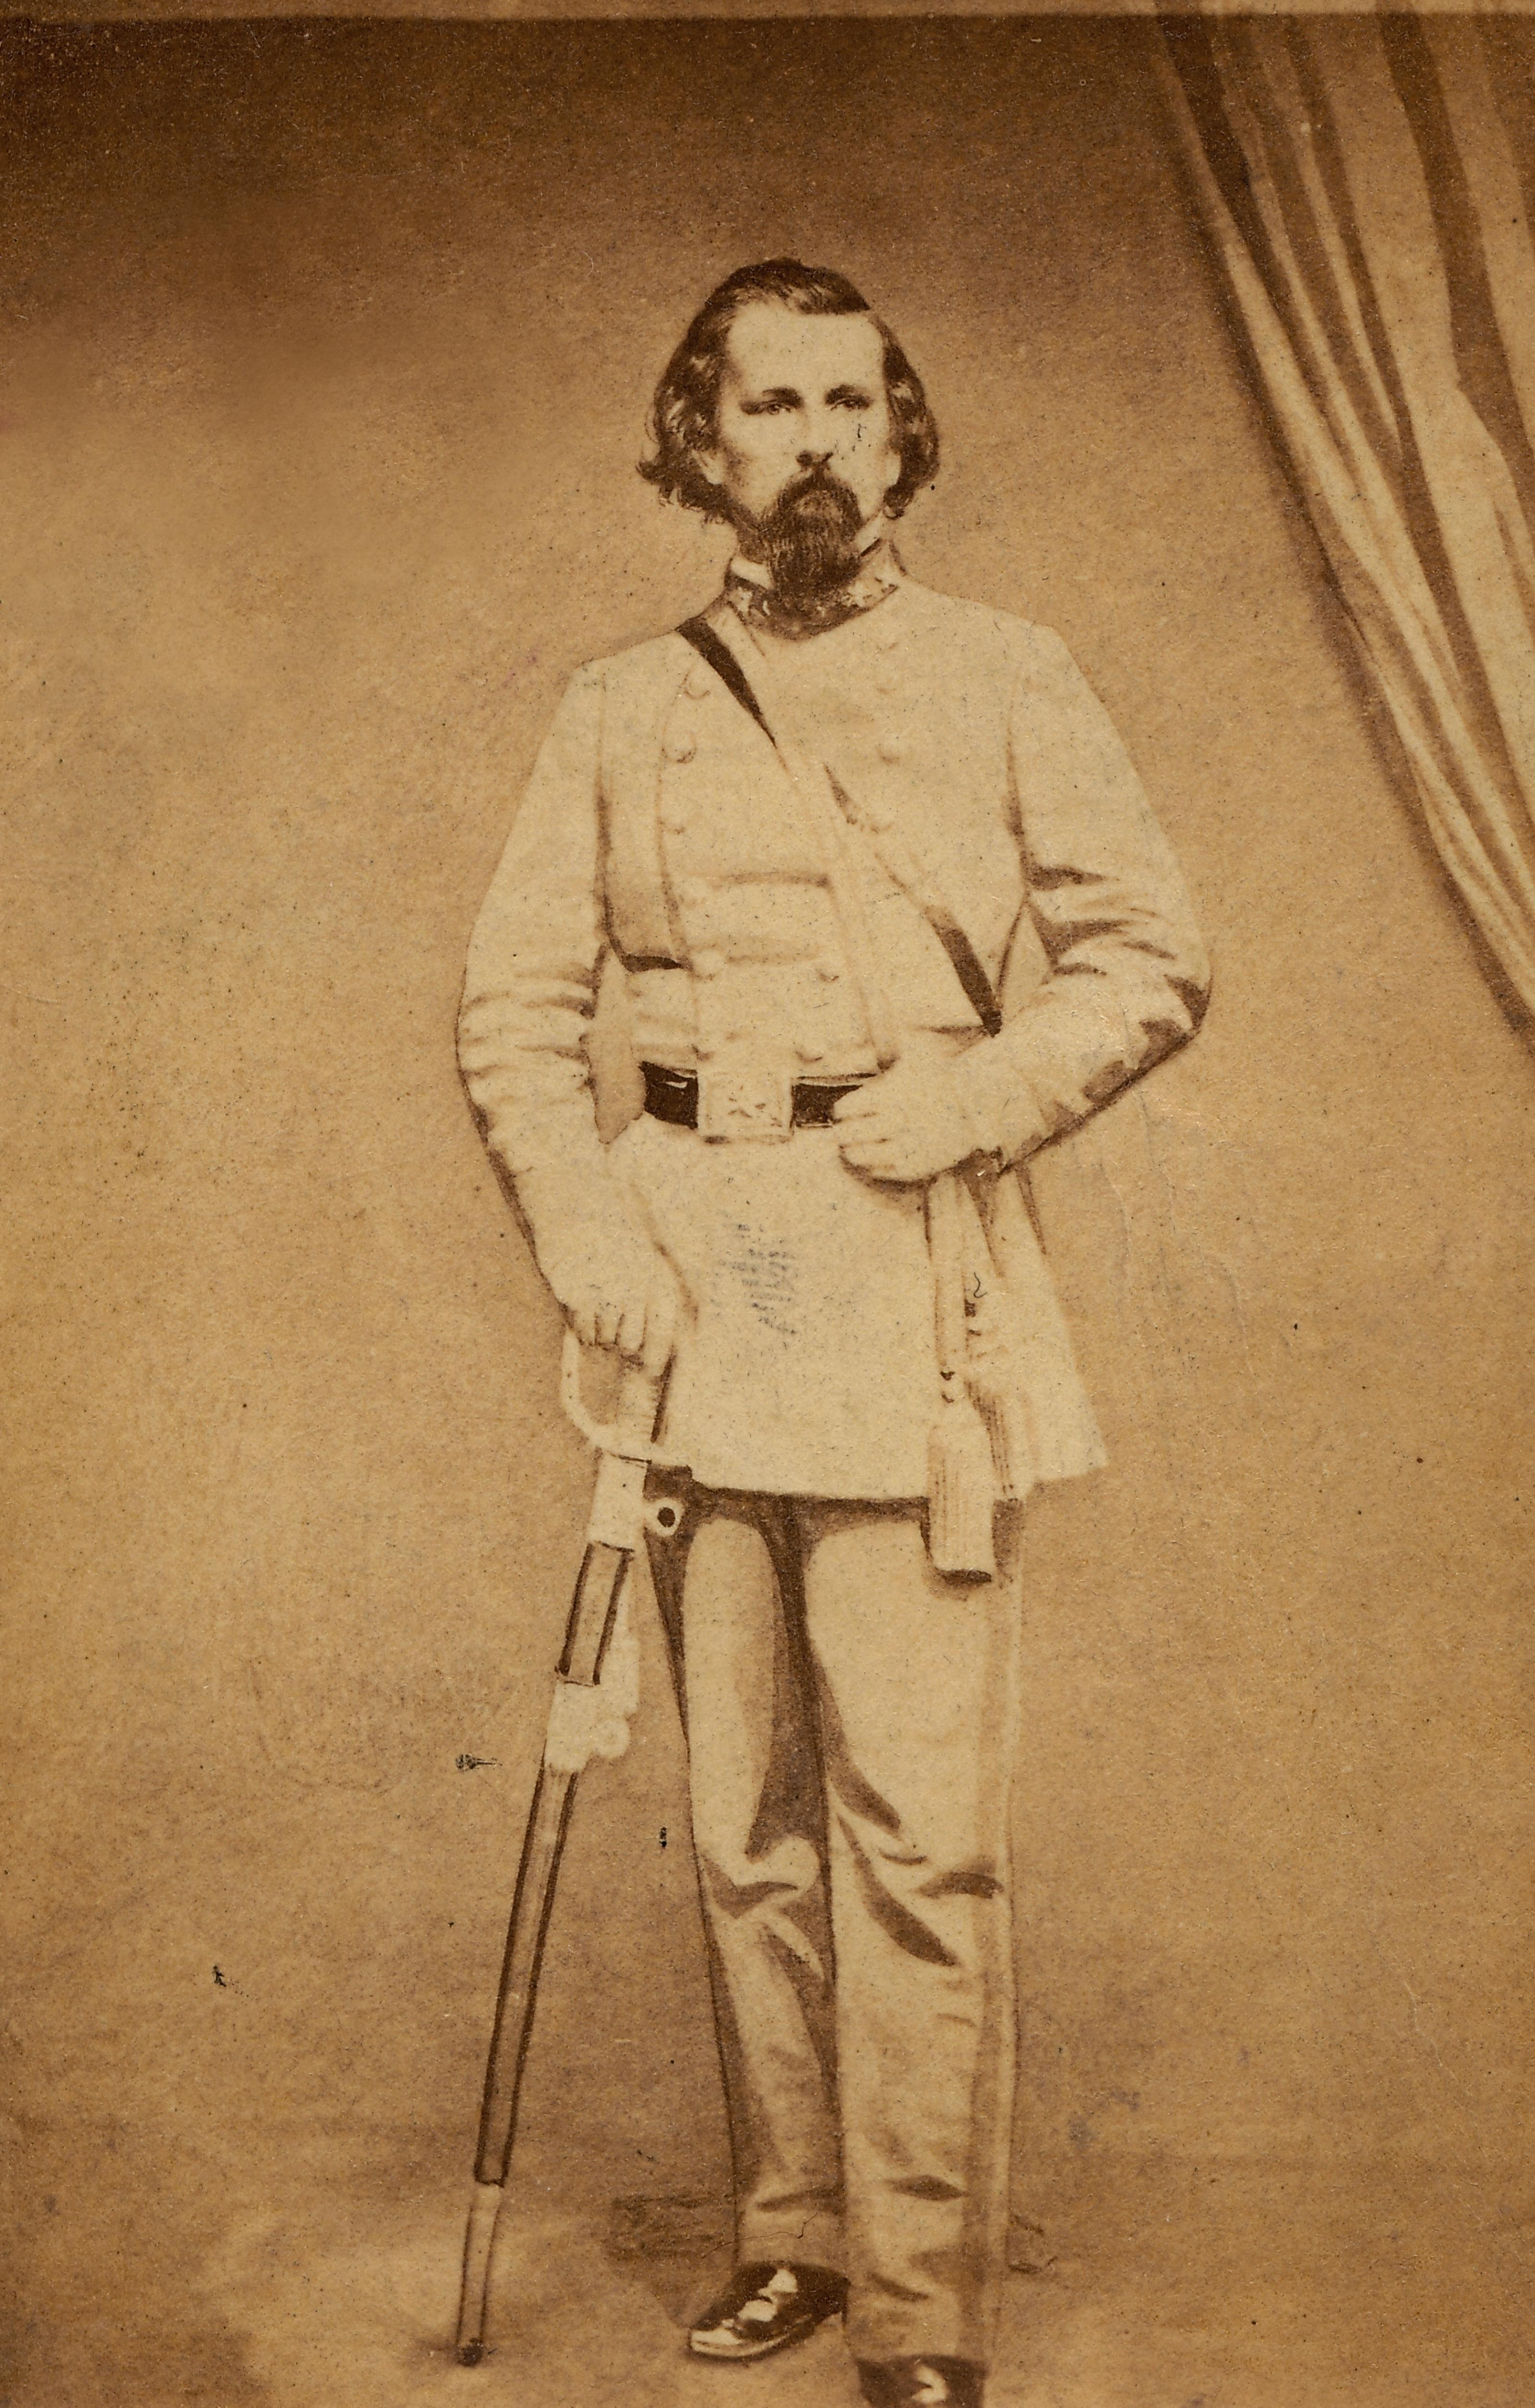 Capitan america civil war hd - 1 6